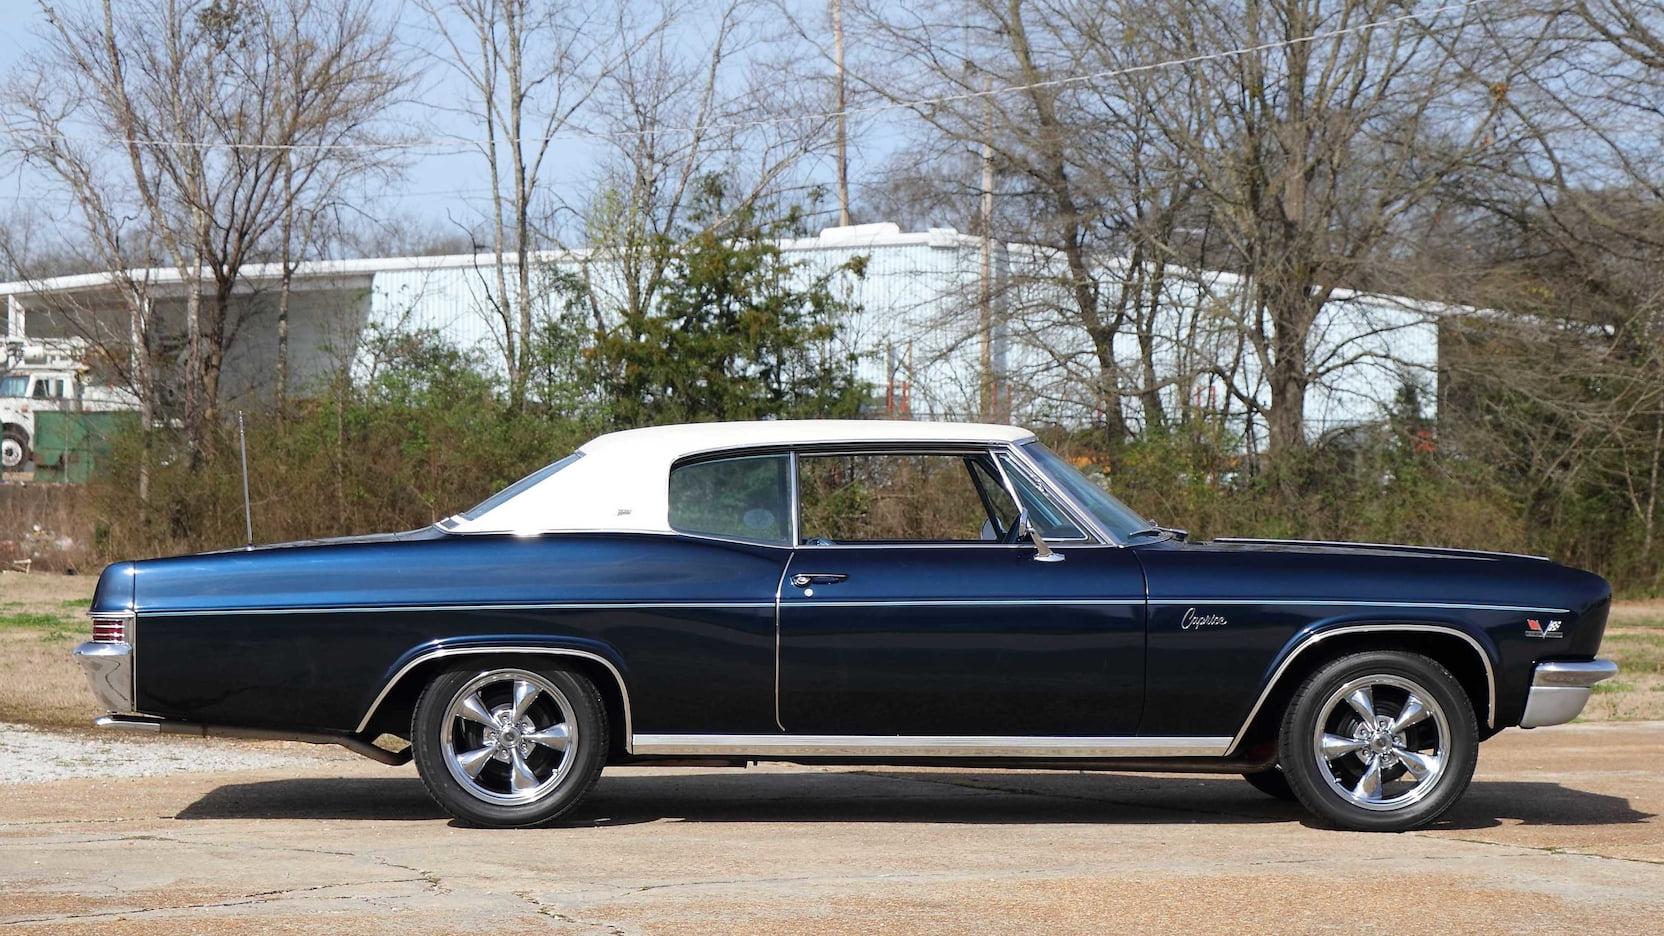 1966 Chevrolet Caprice profile